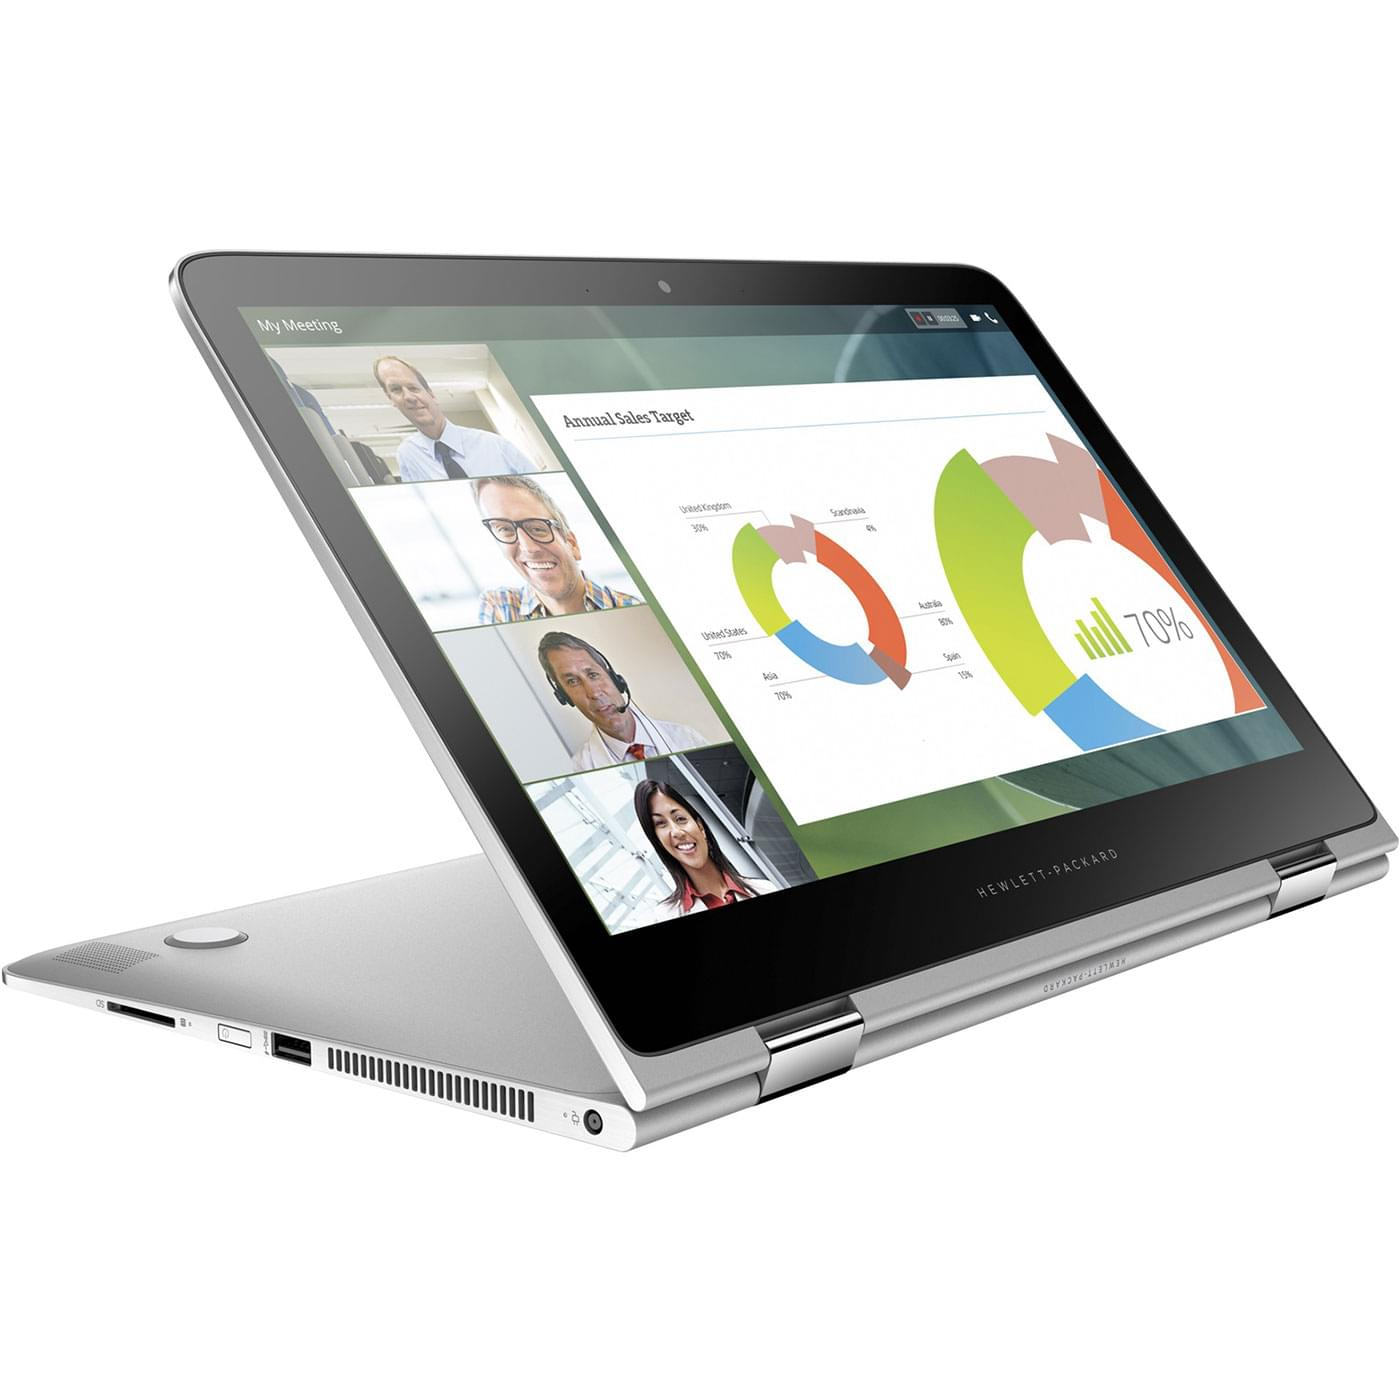 HP Spectre Pro x360 G2 (V1B01EA#ABF) - Achat / Vente PC Portable sur Cybertek.fr - 0